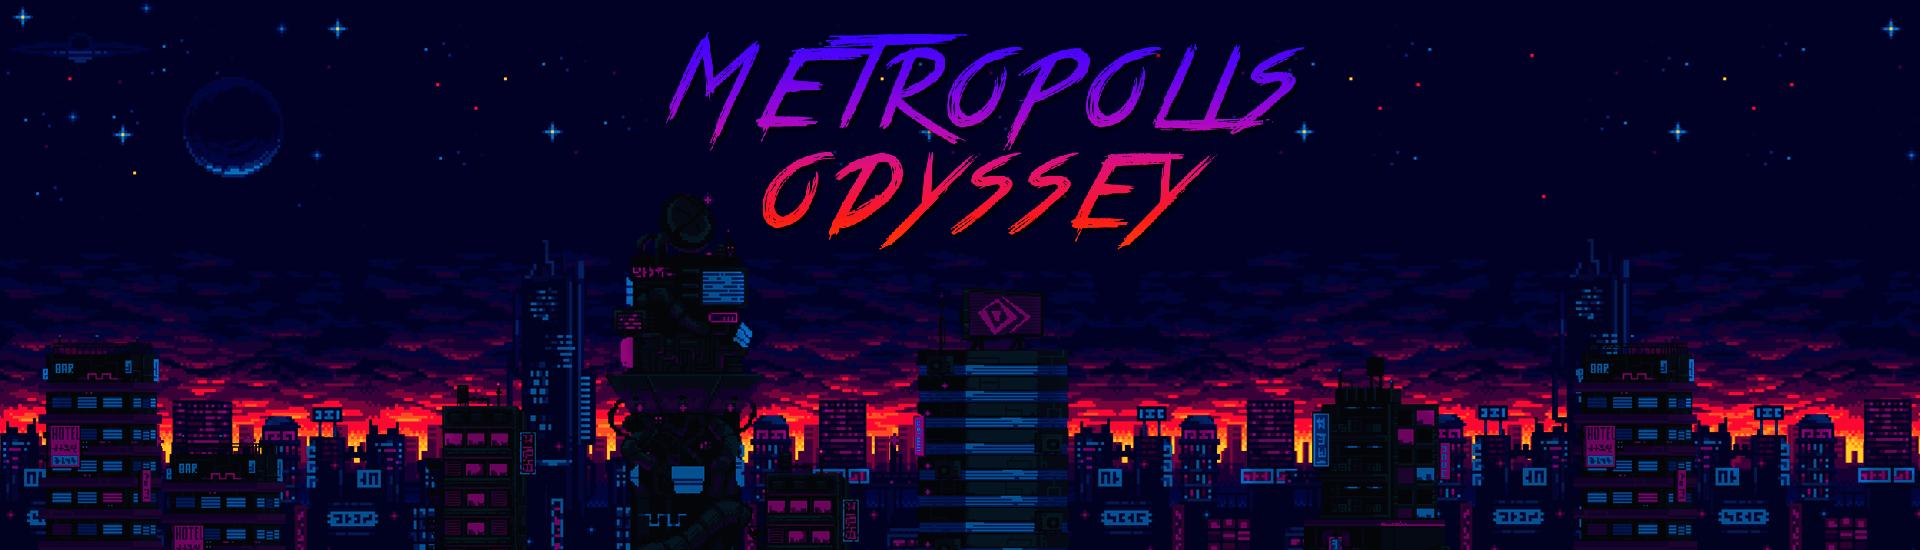 Metropolis Odyssey cover